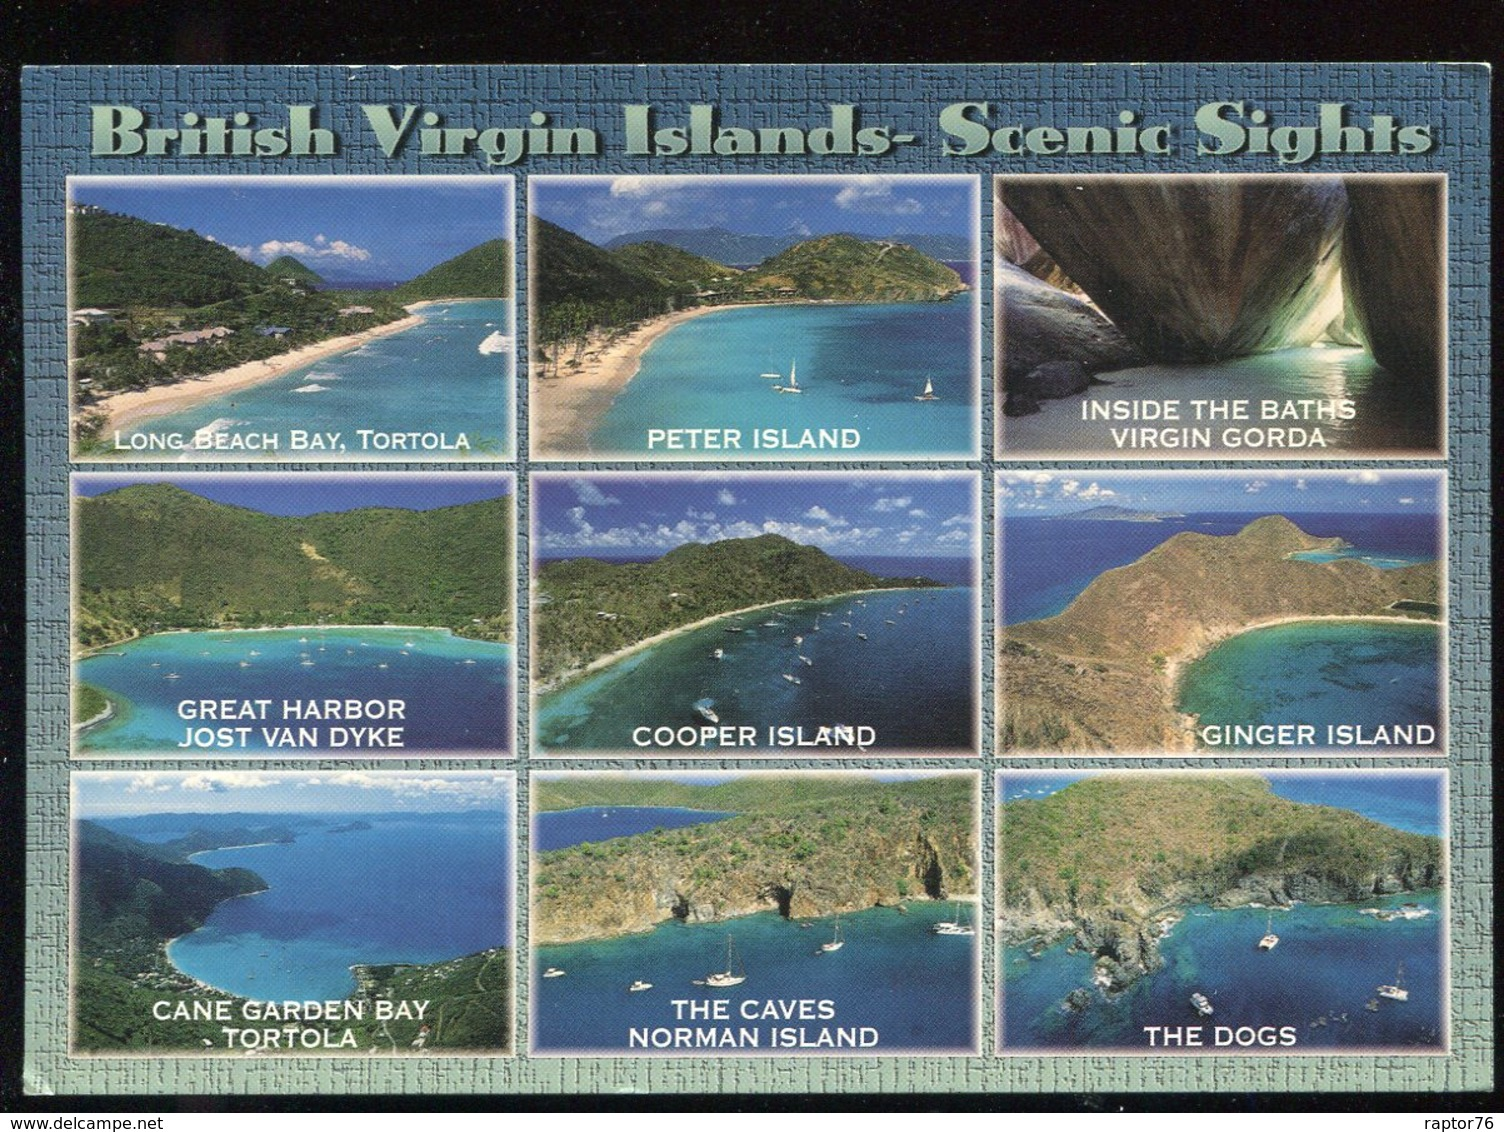 CPM Antilles Iles Vierges British Virgin Islands Scnic Sights Multi Vues - Vierges (Iles), Britann.